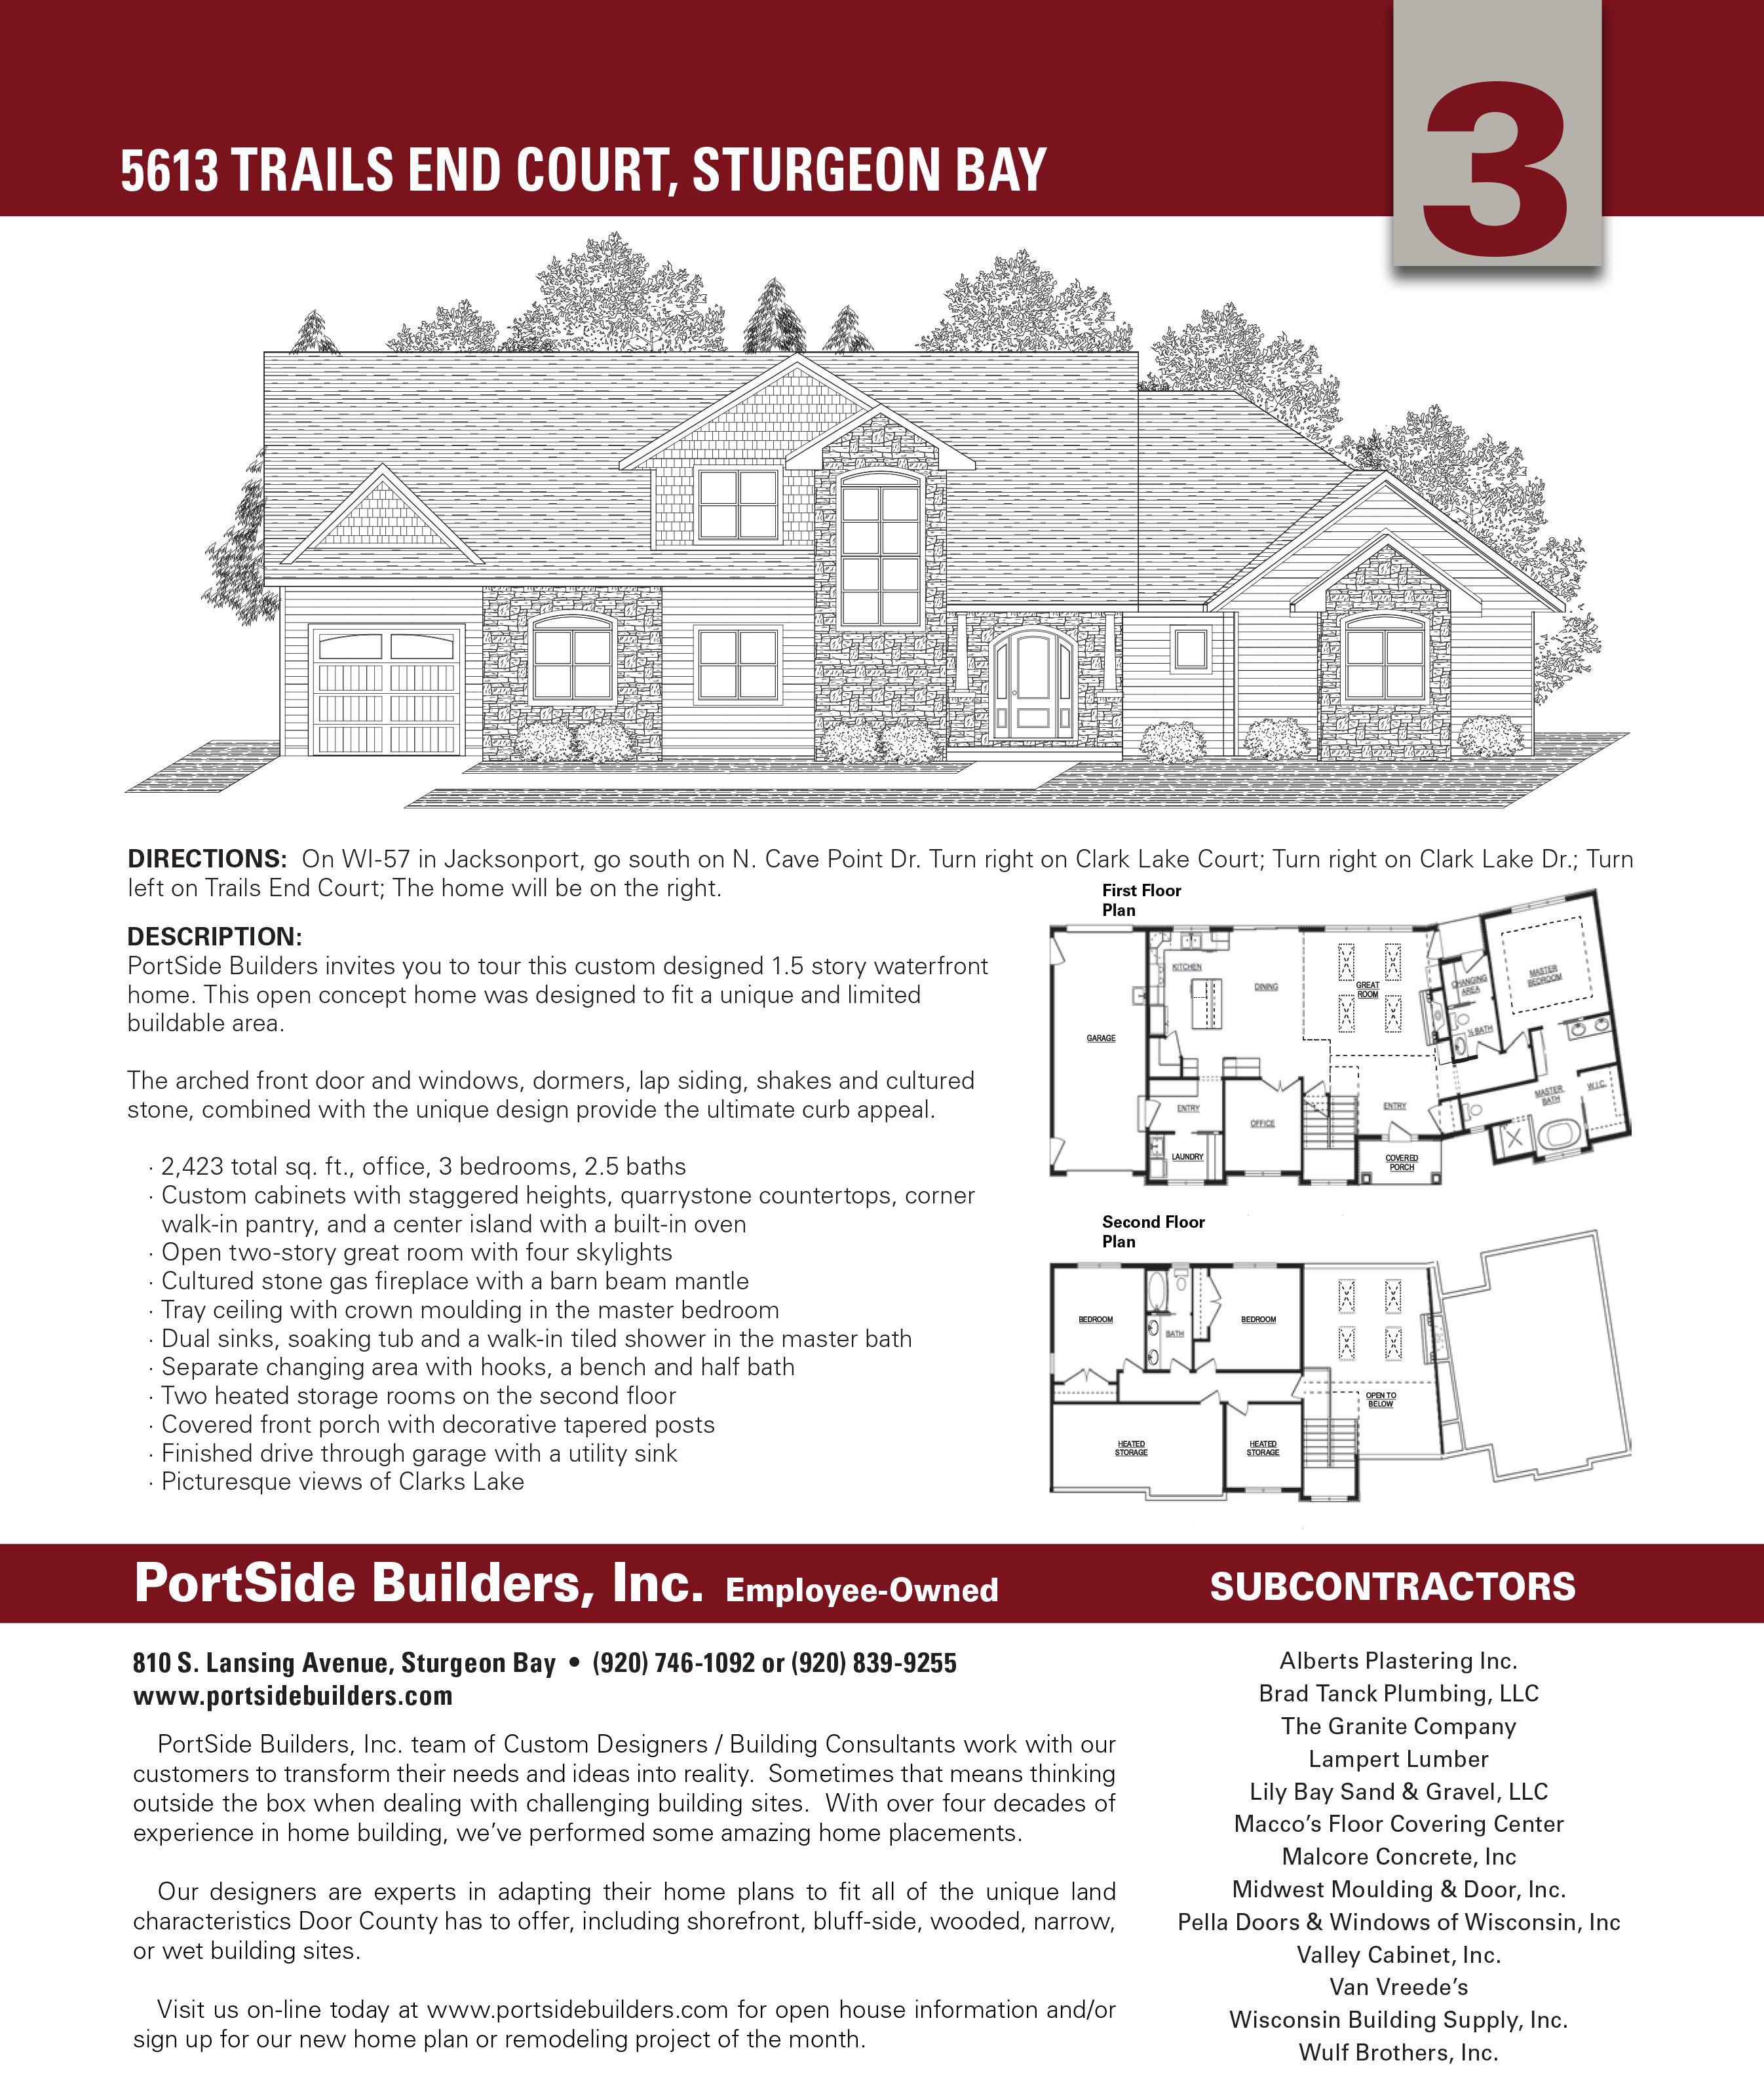 Portside Builders Inc.